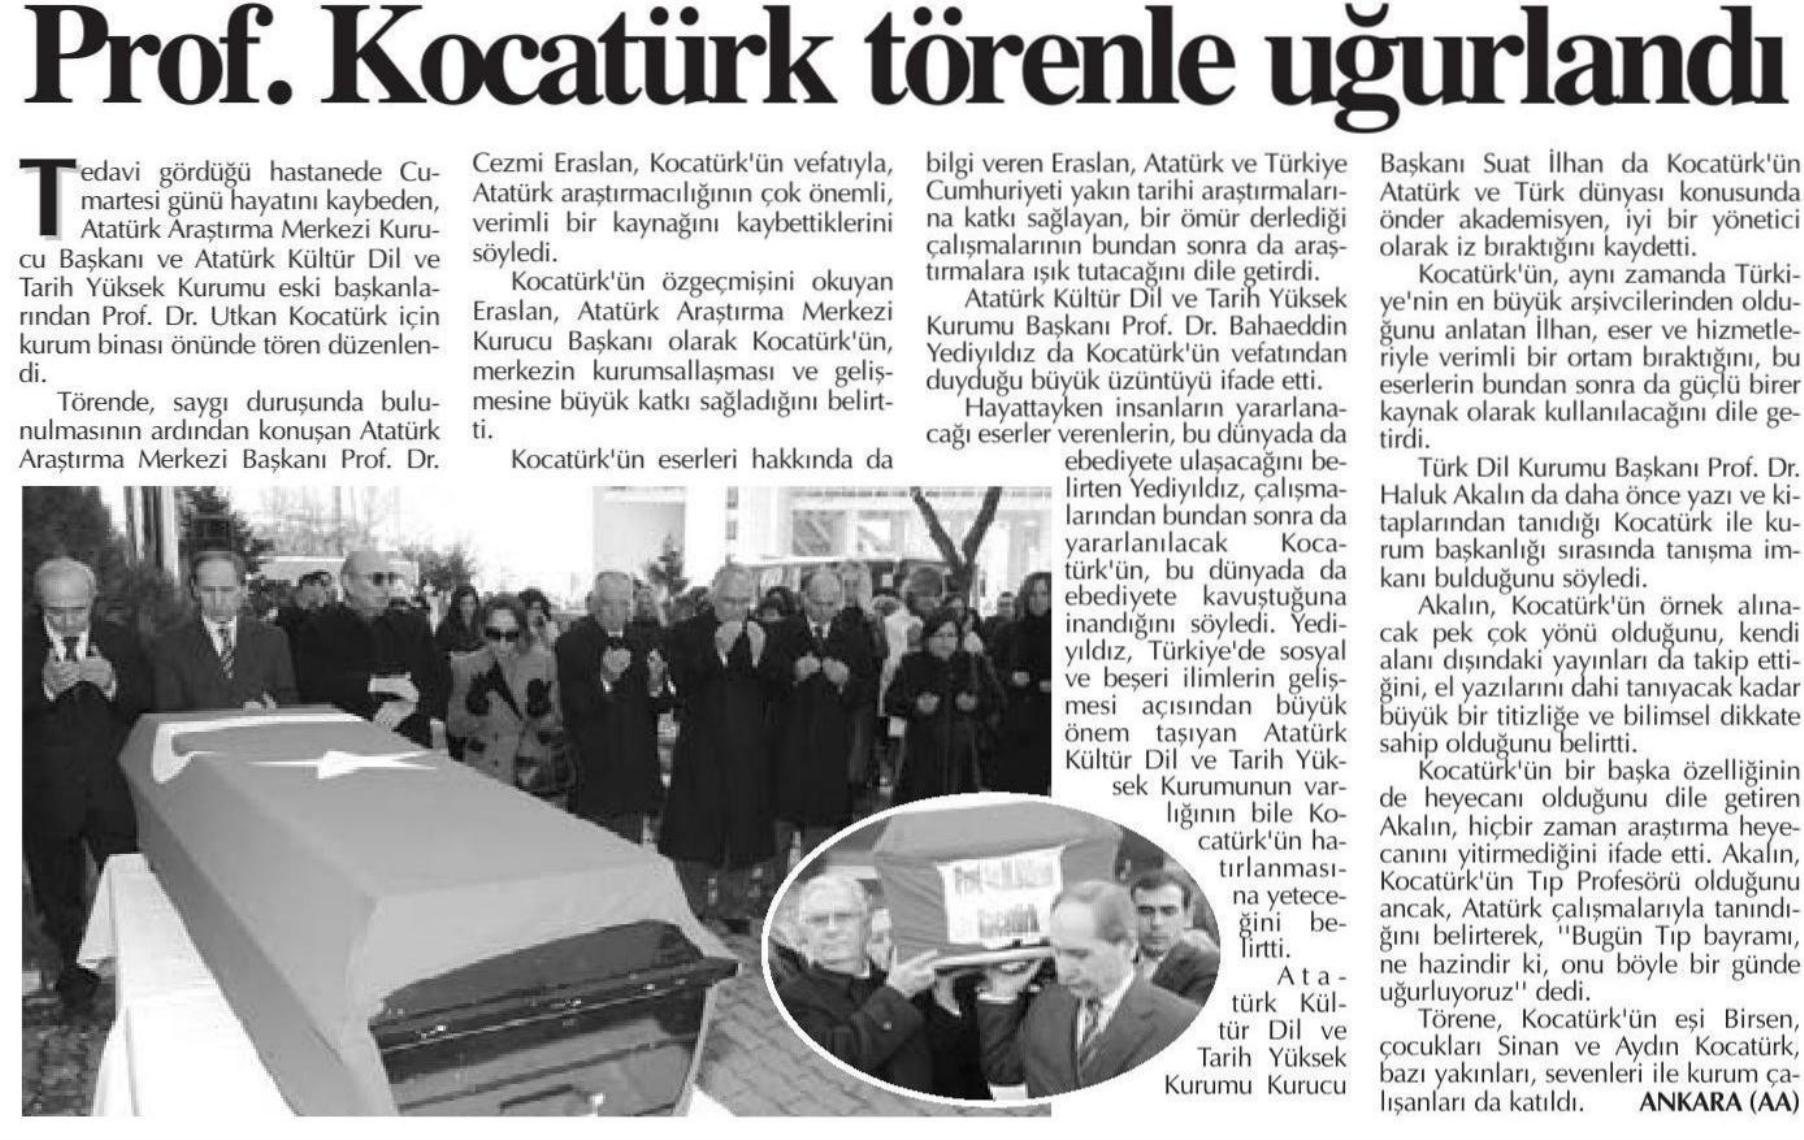 BASKENT_GAZETESI_20110315